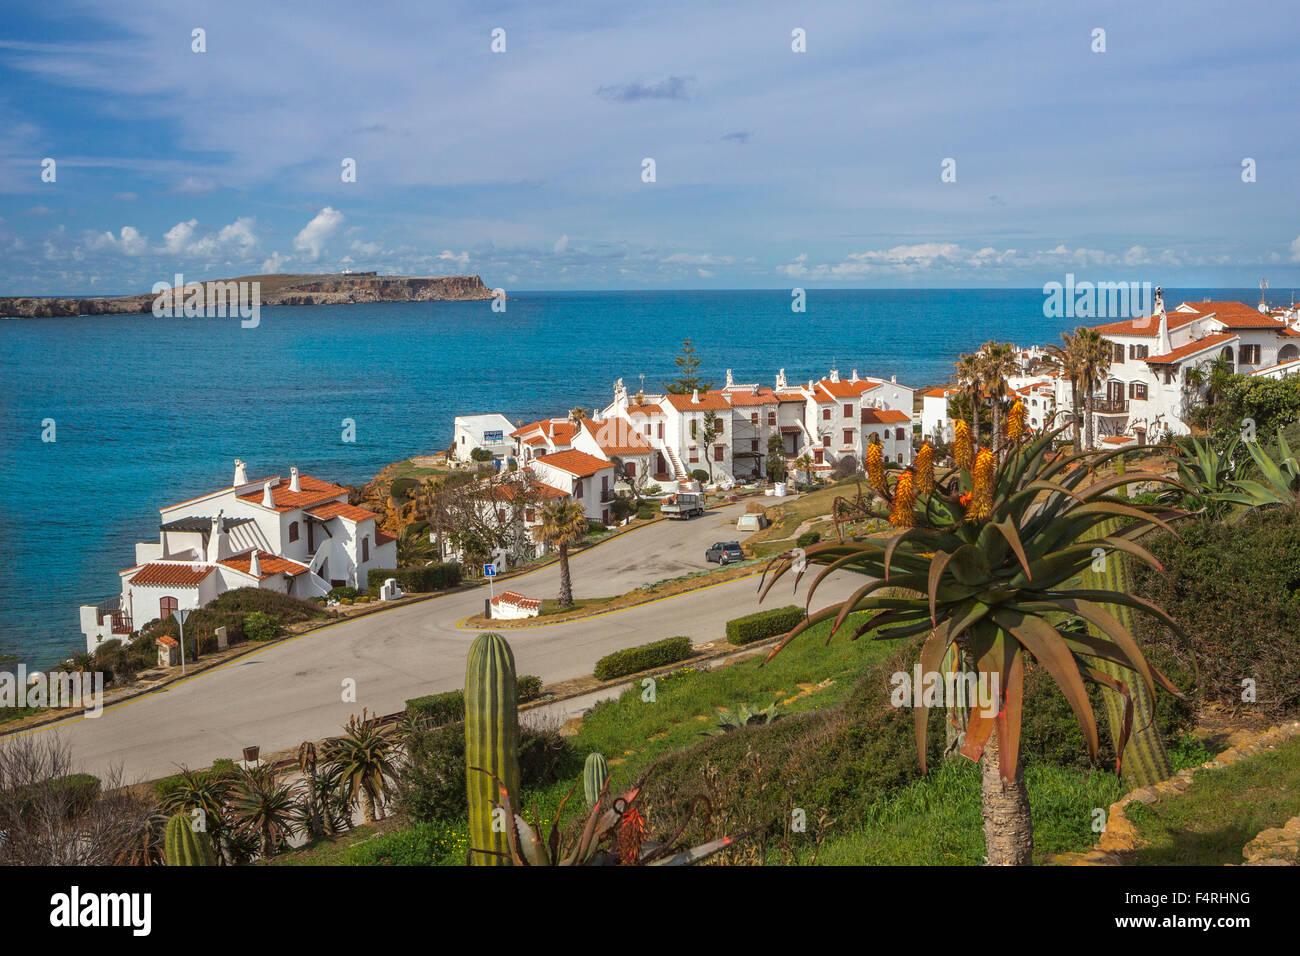 Fornells, Menorca, Balearen, Spanien, Europa, Frühling, Landschaft, Architektur, Balearen, bunt, mediterran, Stockbild